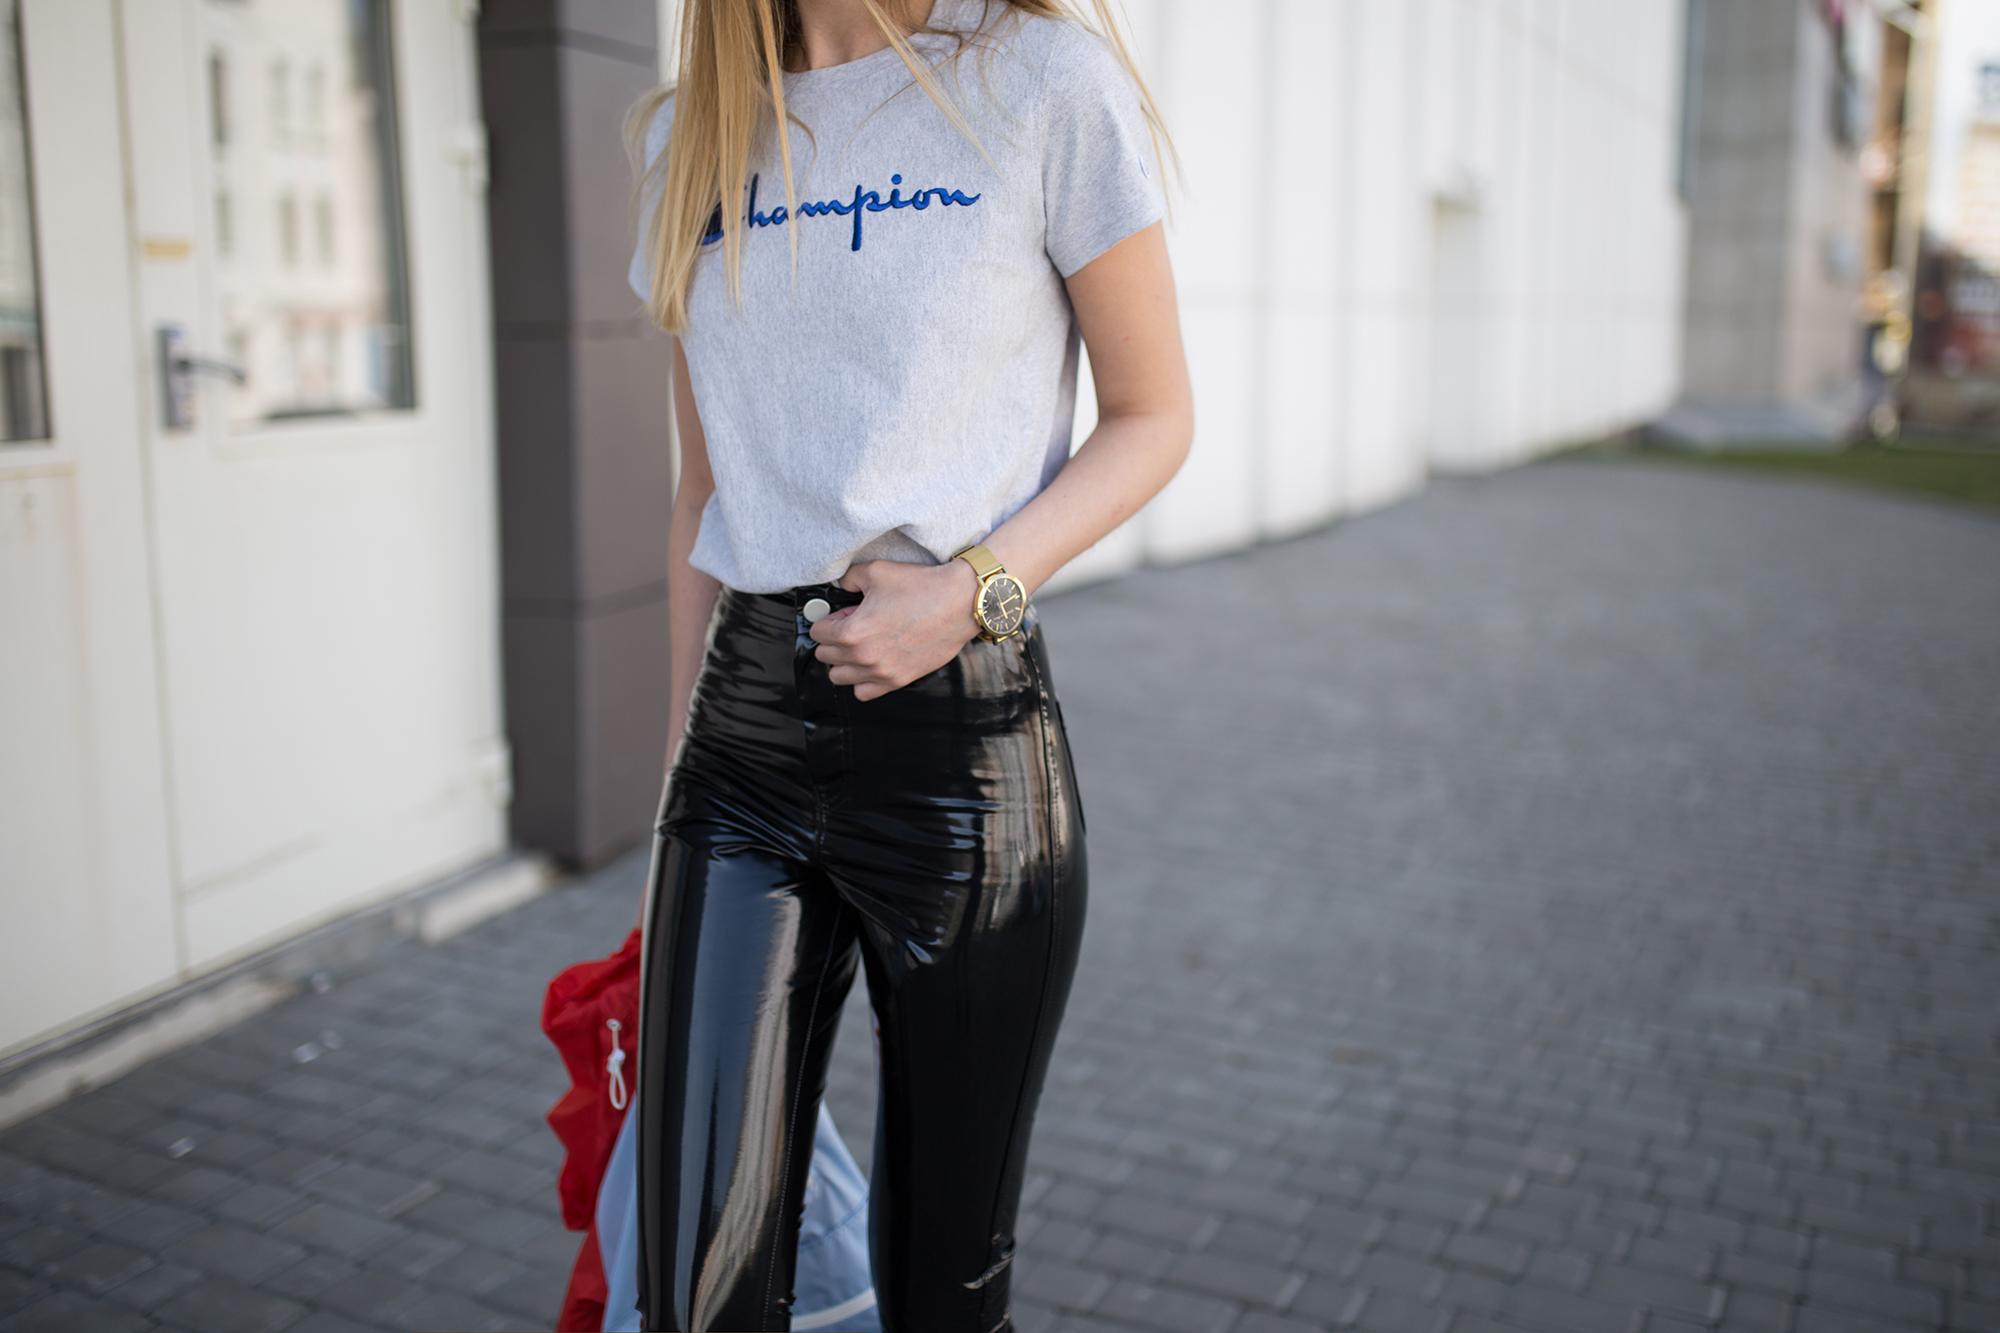 champion-brand-sportswear-logo-shirt-top